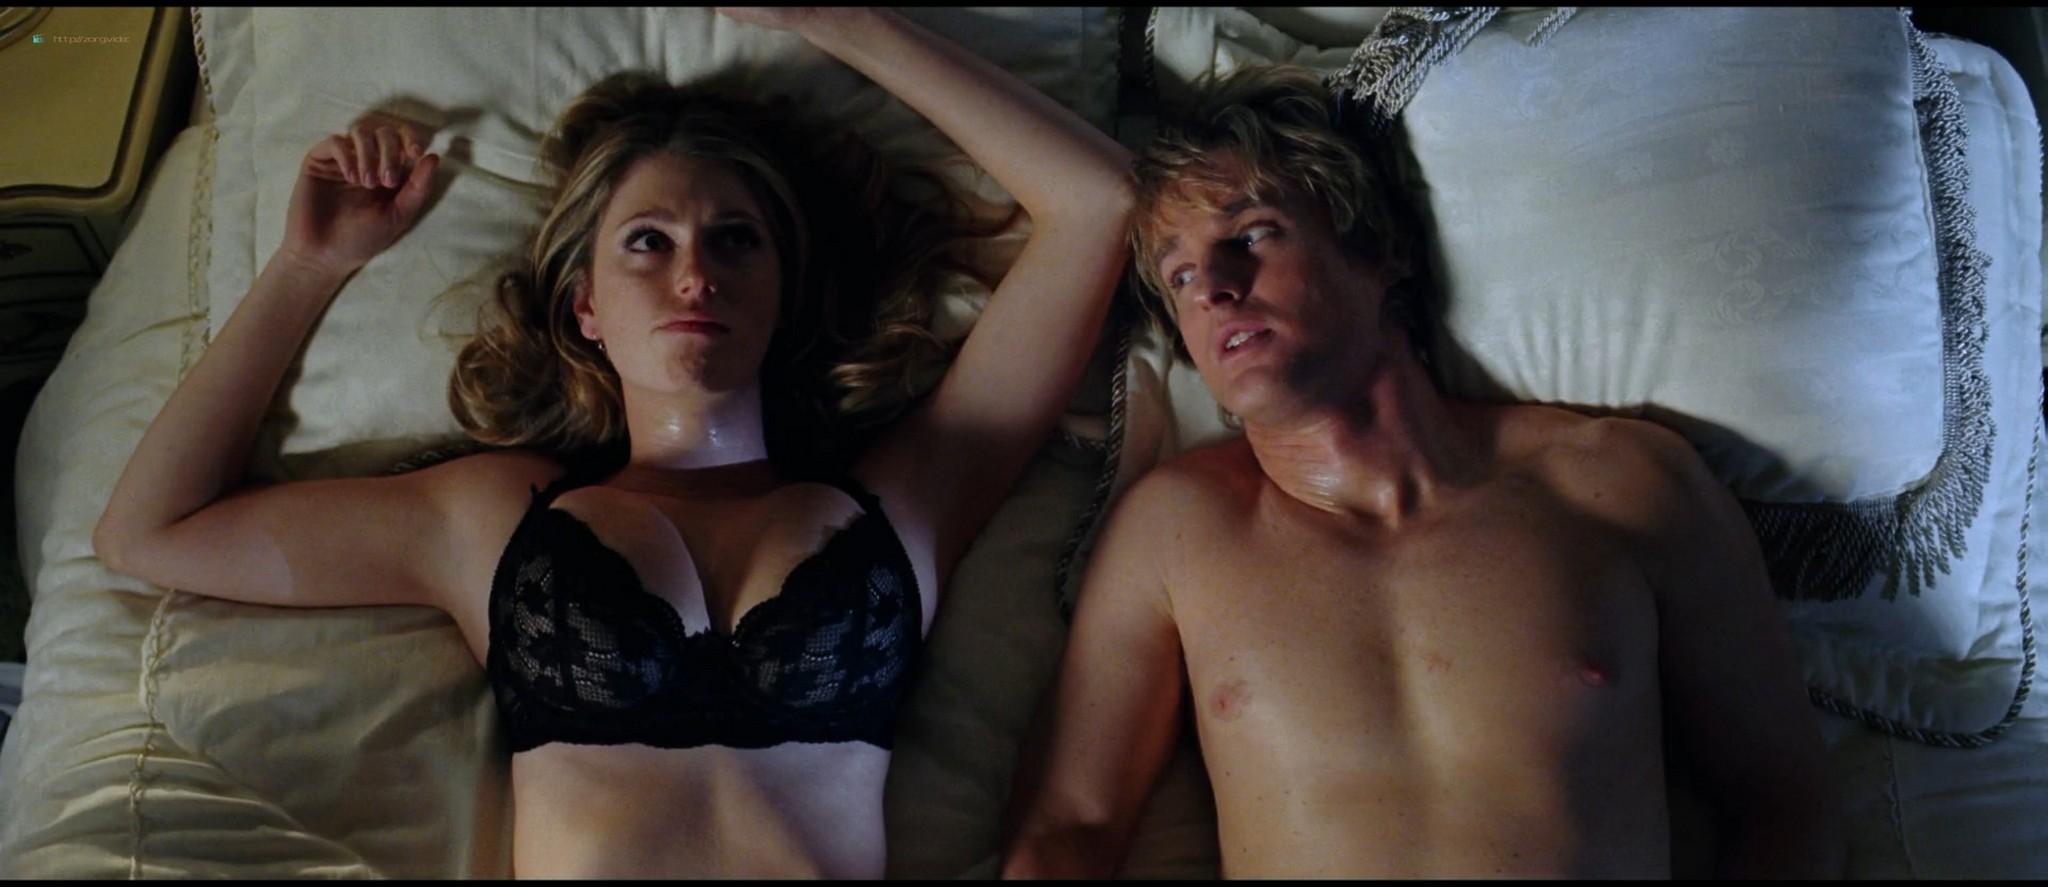 Diora Baird nude topless huge boobs others nude too - Wedding Crashers (2005) HD 1080p BluRay (2)